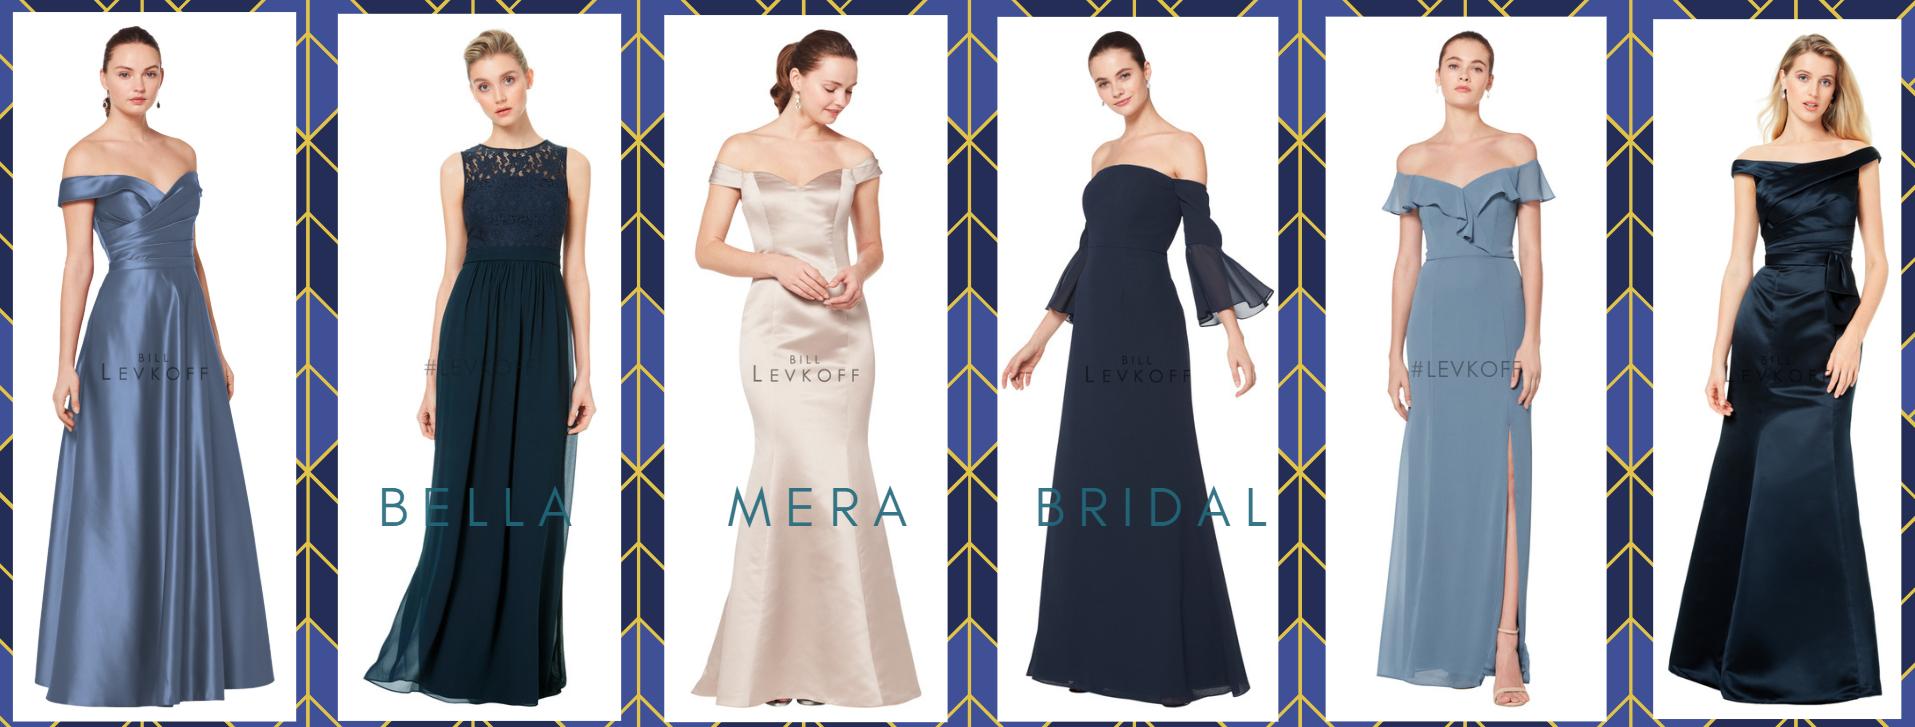 3ada8c6d697 Jenny Yoo Bridesmaid Dresses Size Chart